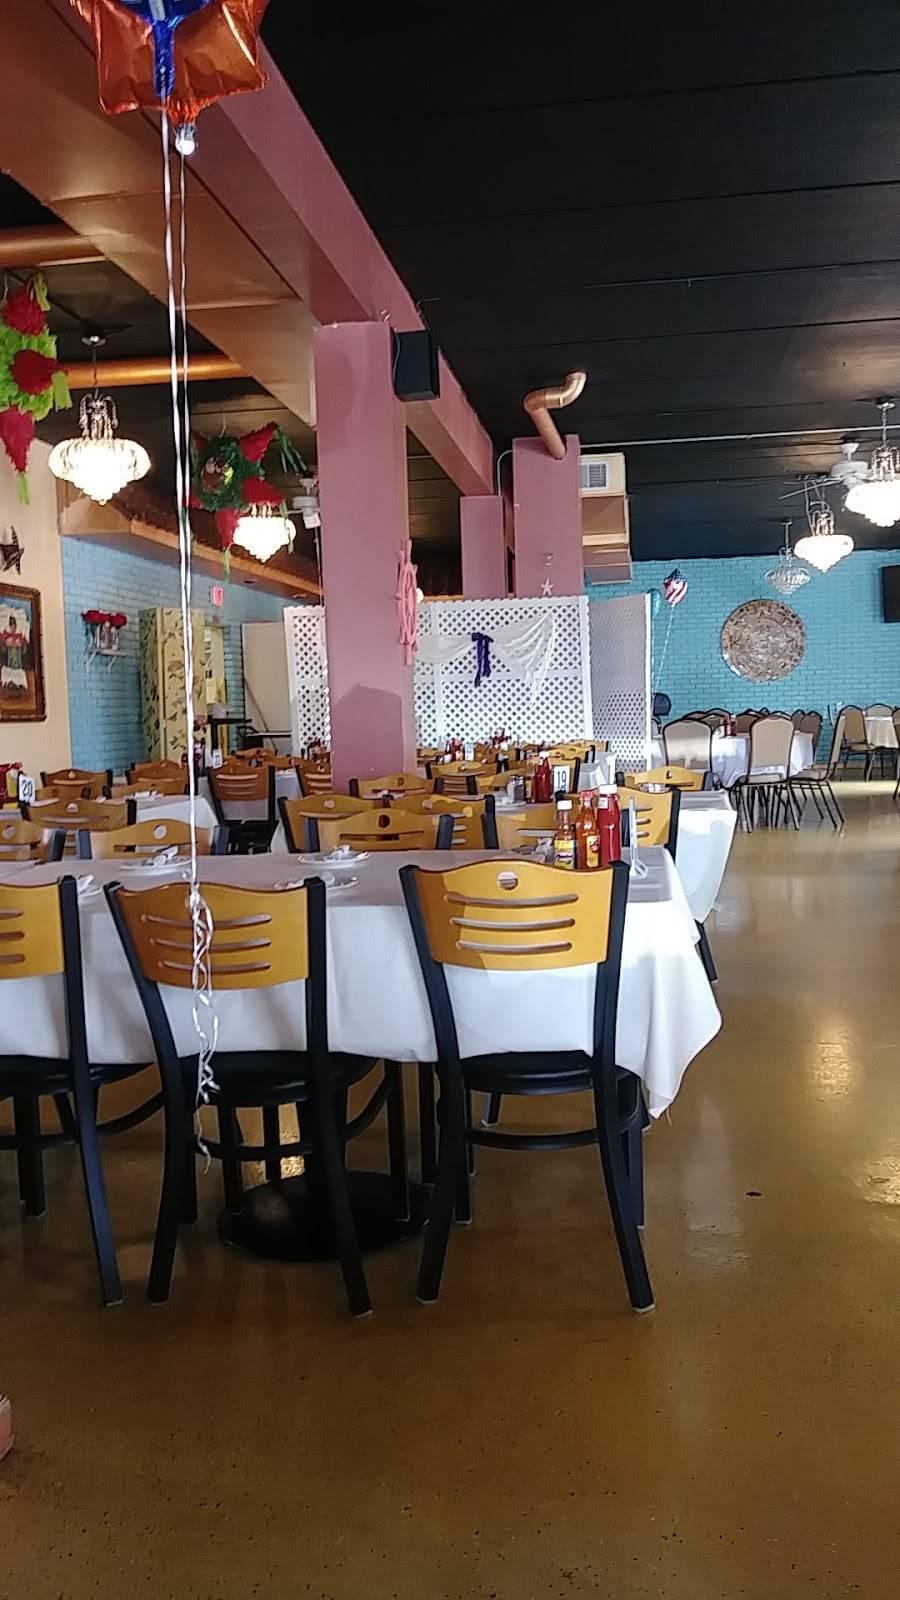 Riviera Nayarit | restaurant | 11456 W Wadsworth Rd, Beach Park, IL 60099, USA | 8472463057 OR +1 847-246-3057